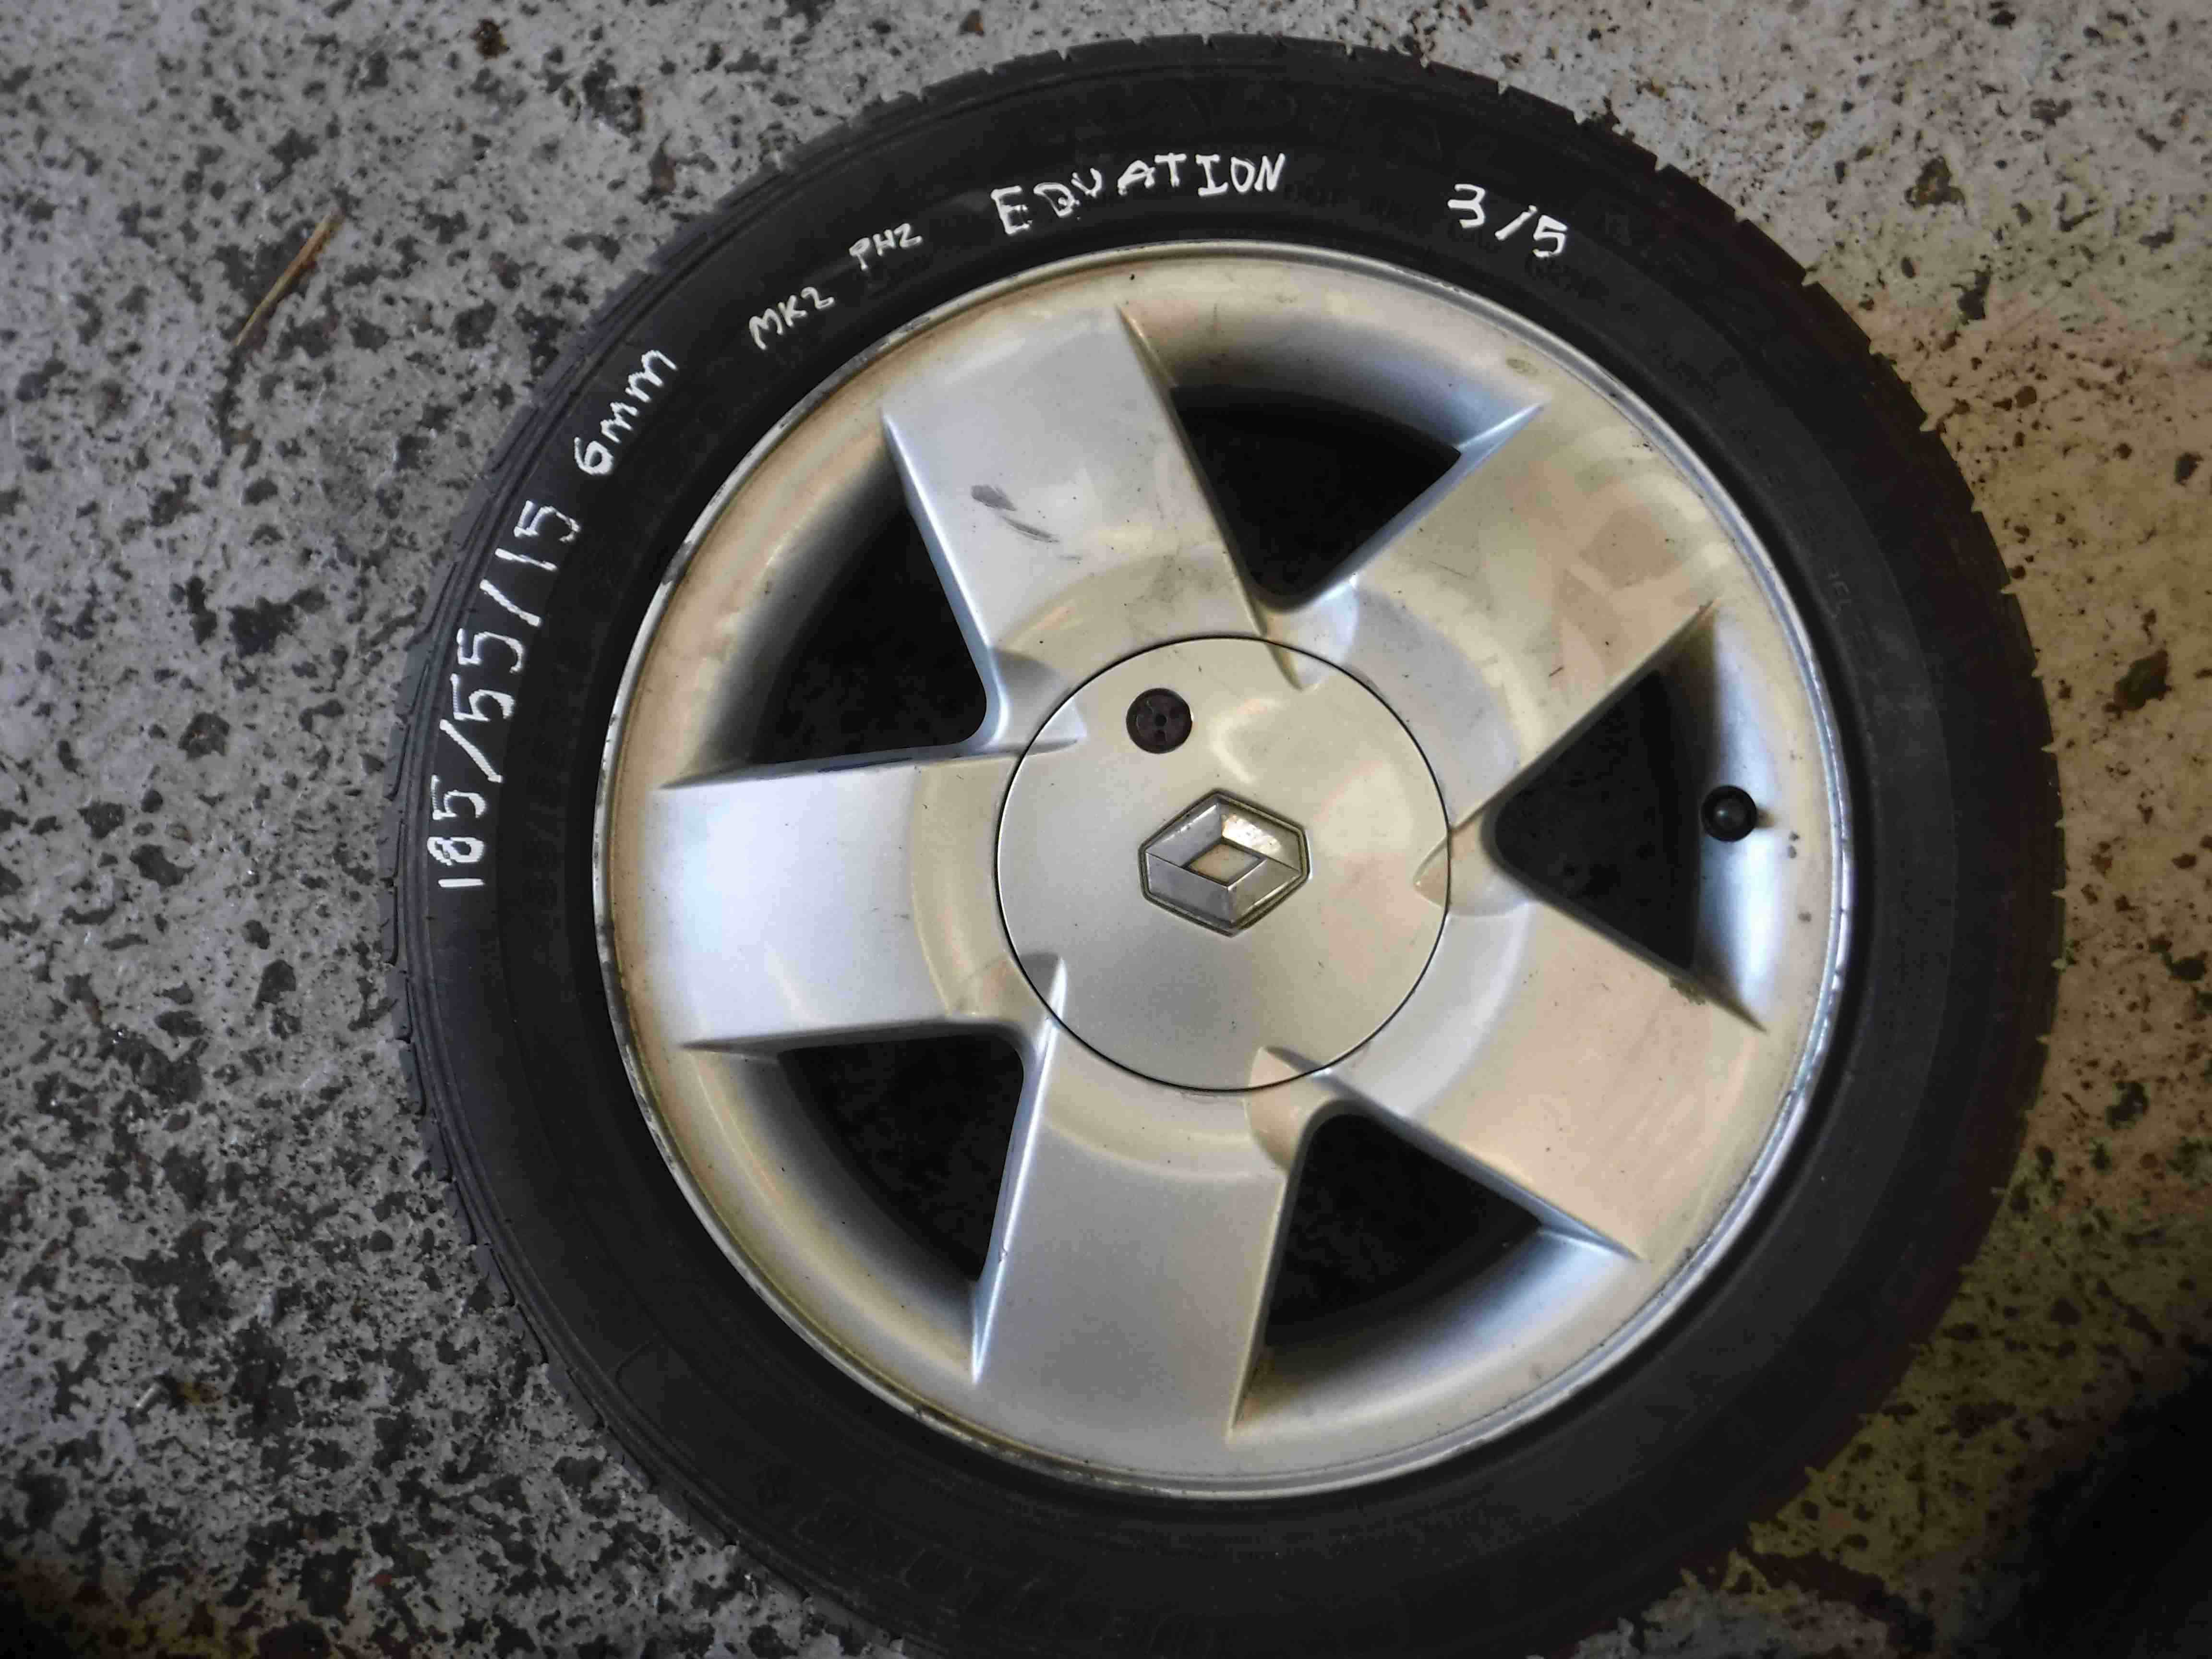 Renault Clio MK2 2001-2006 Equation Alloy Wheel  Tyre 185 55 15 7mm 3/5